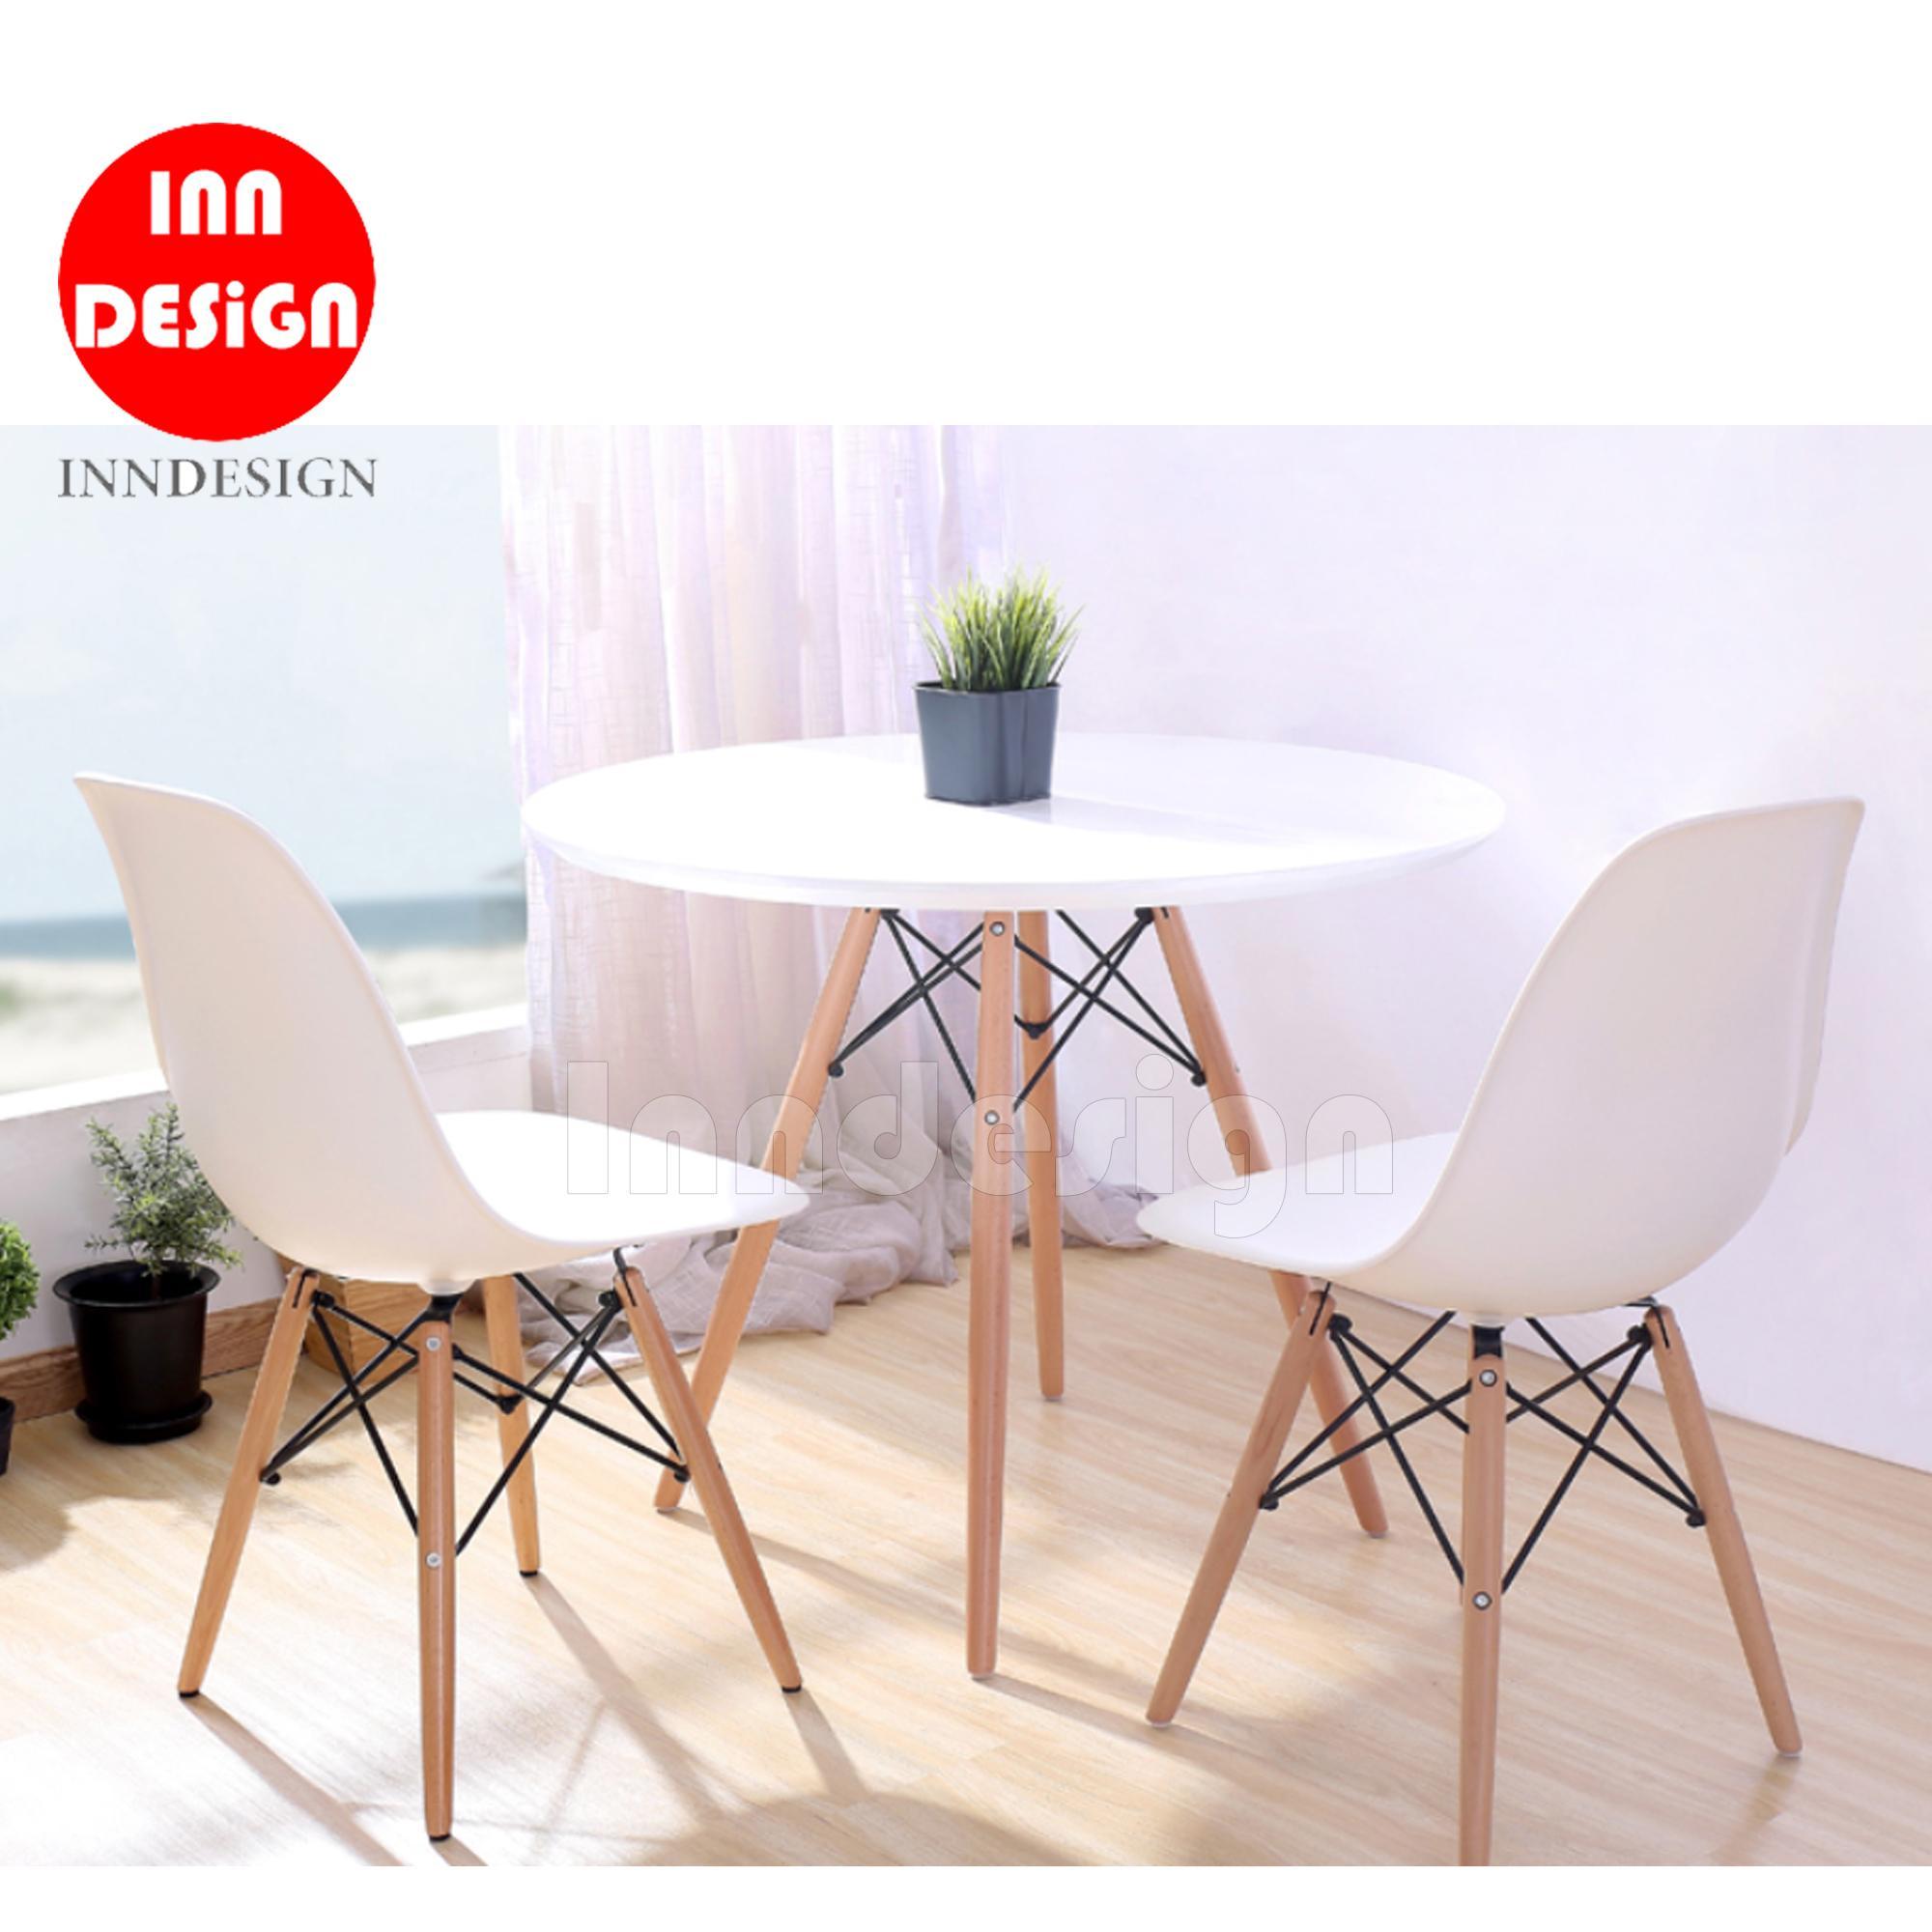 Eames 1+2 Dining Set / Coffee Table Set / Lounge Set